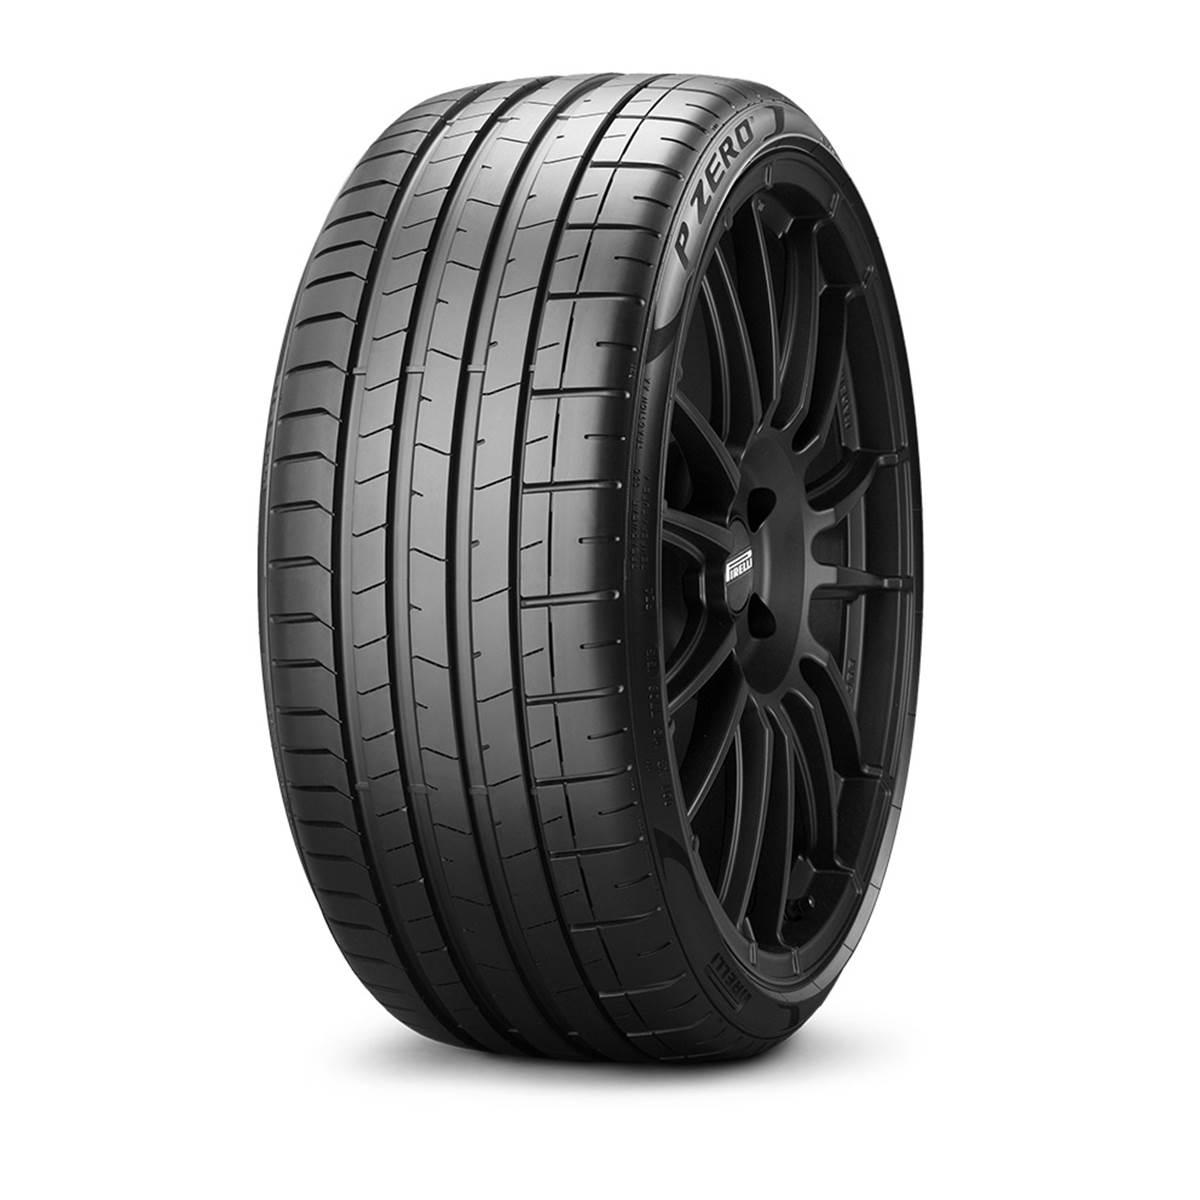 Pneu Pirelli 235/45R20 100W Pzero XL